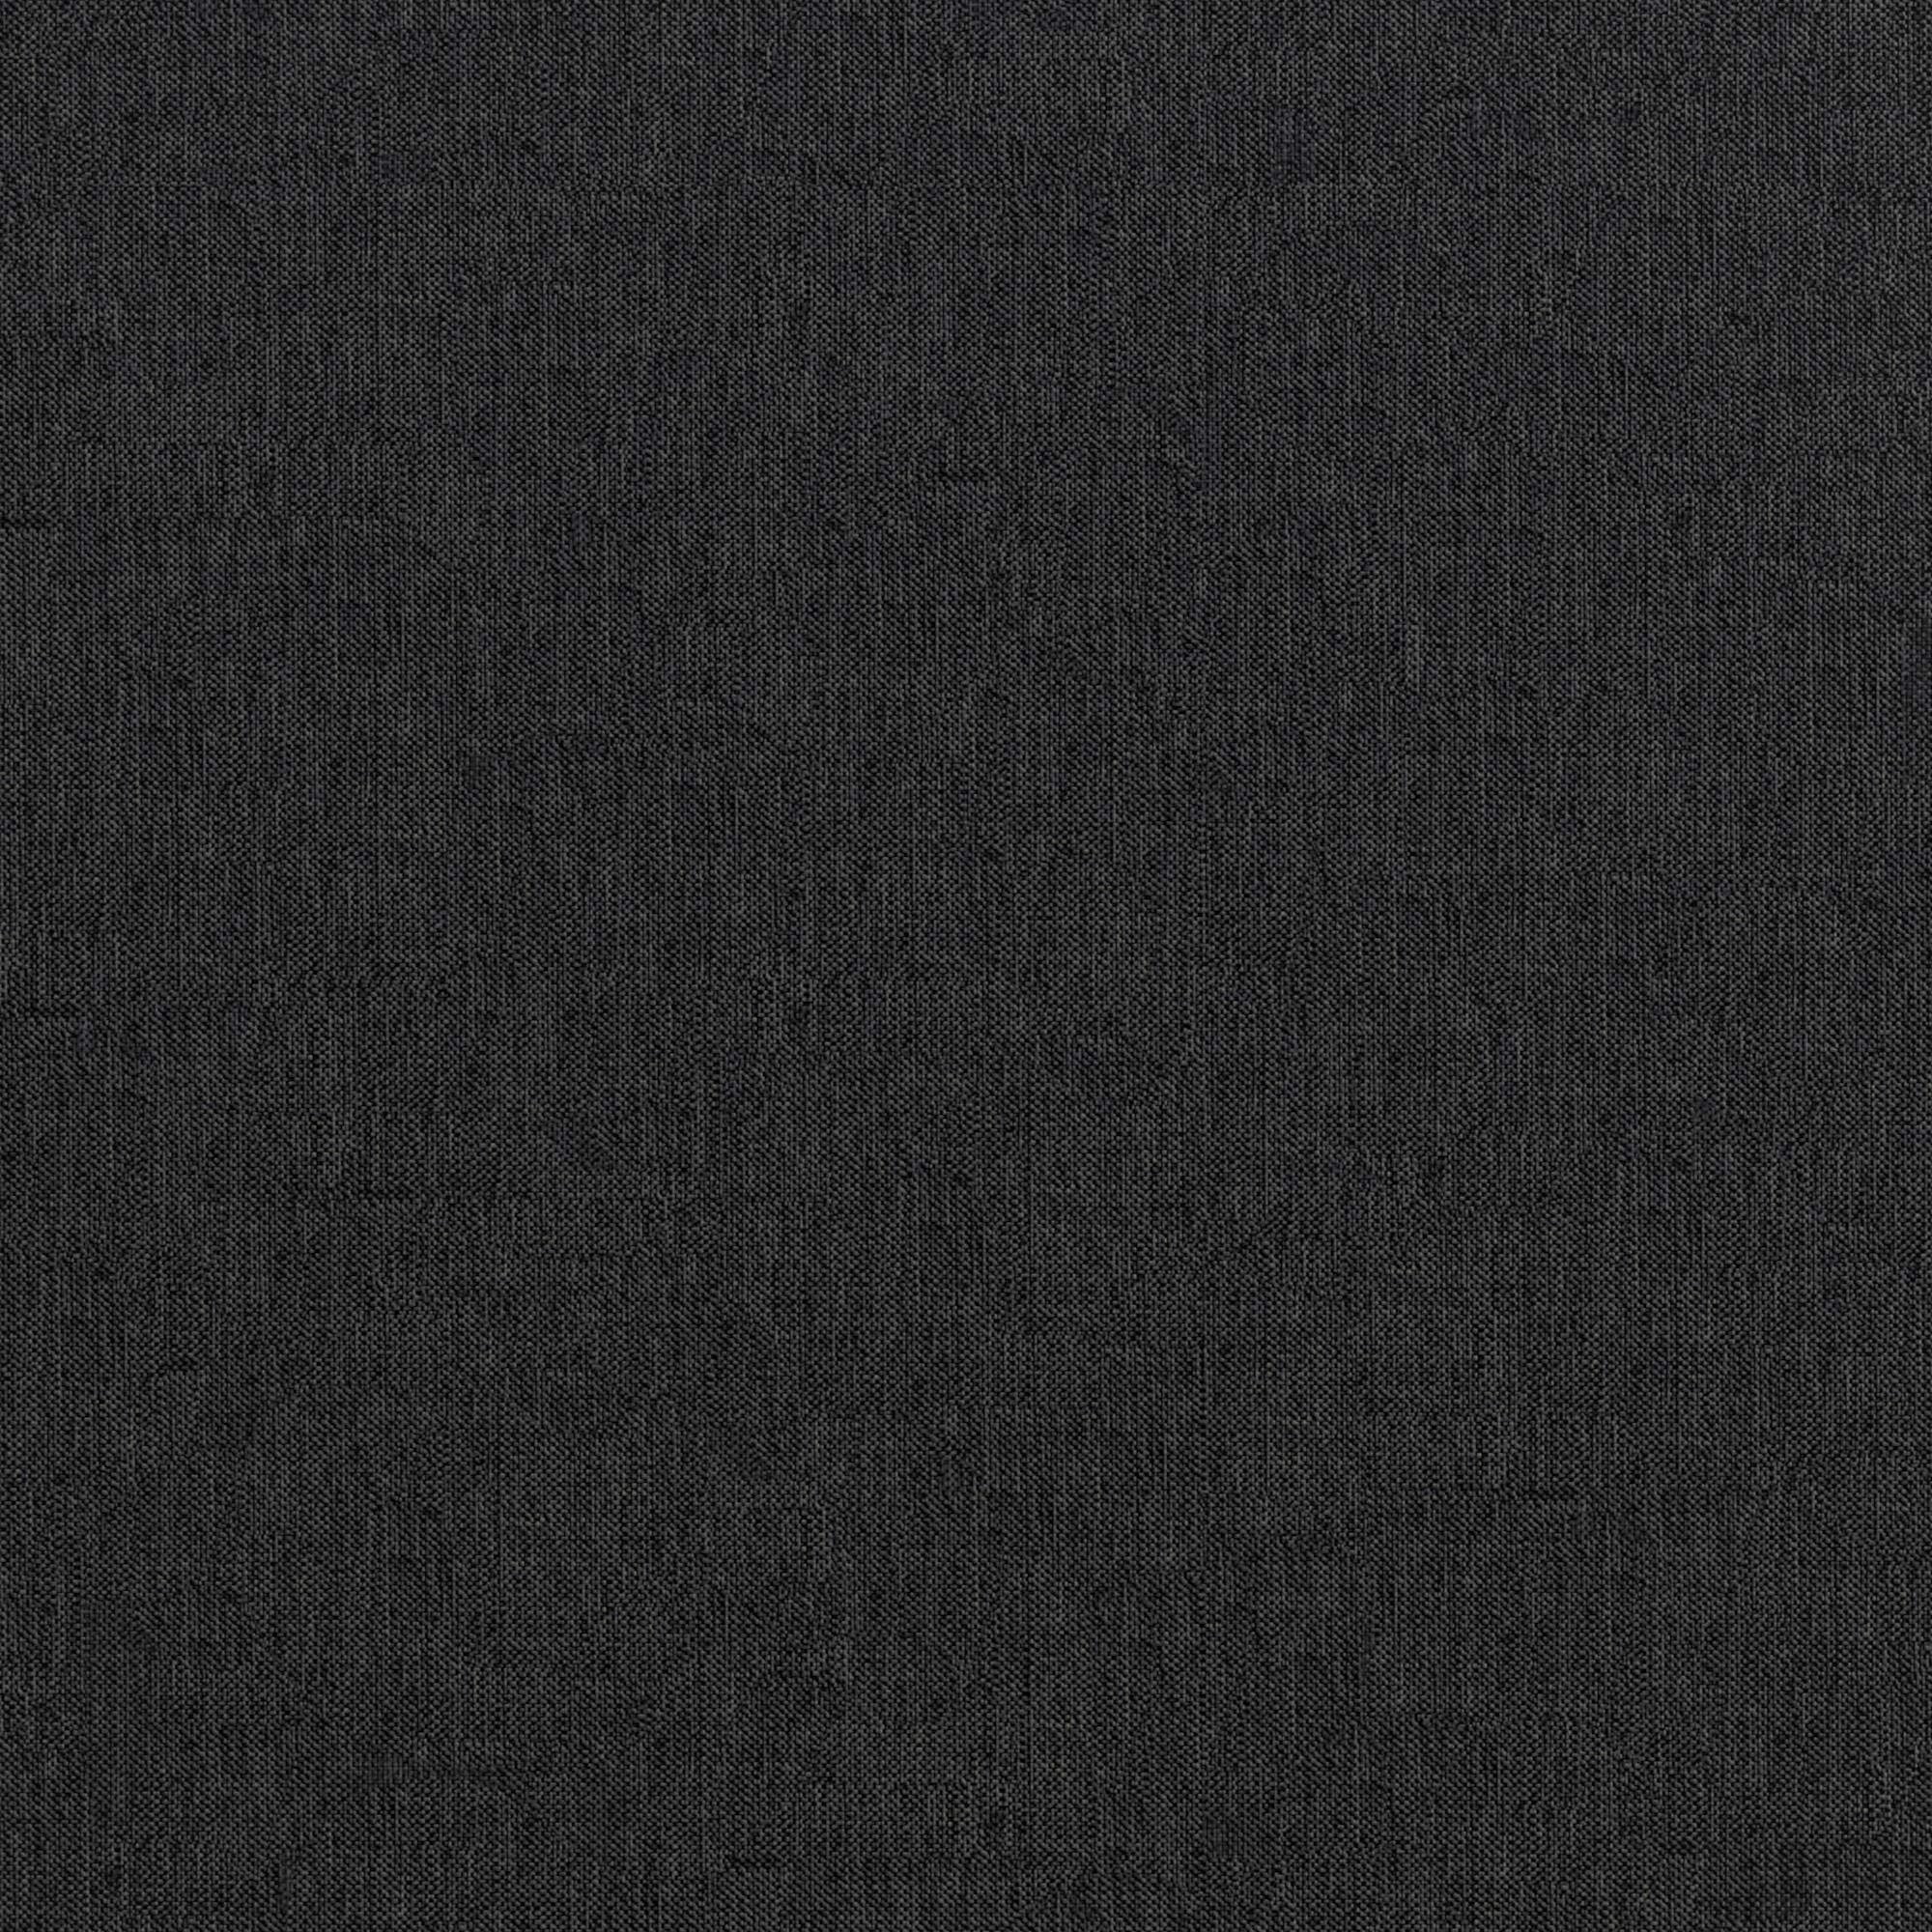 Novogratz Kelly Bed with Storage, Queen, Dark Gray Linen by Novogratz (Image #2)